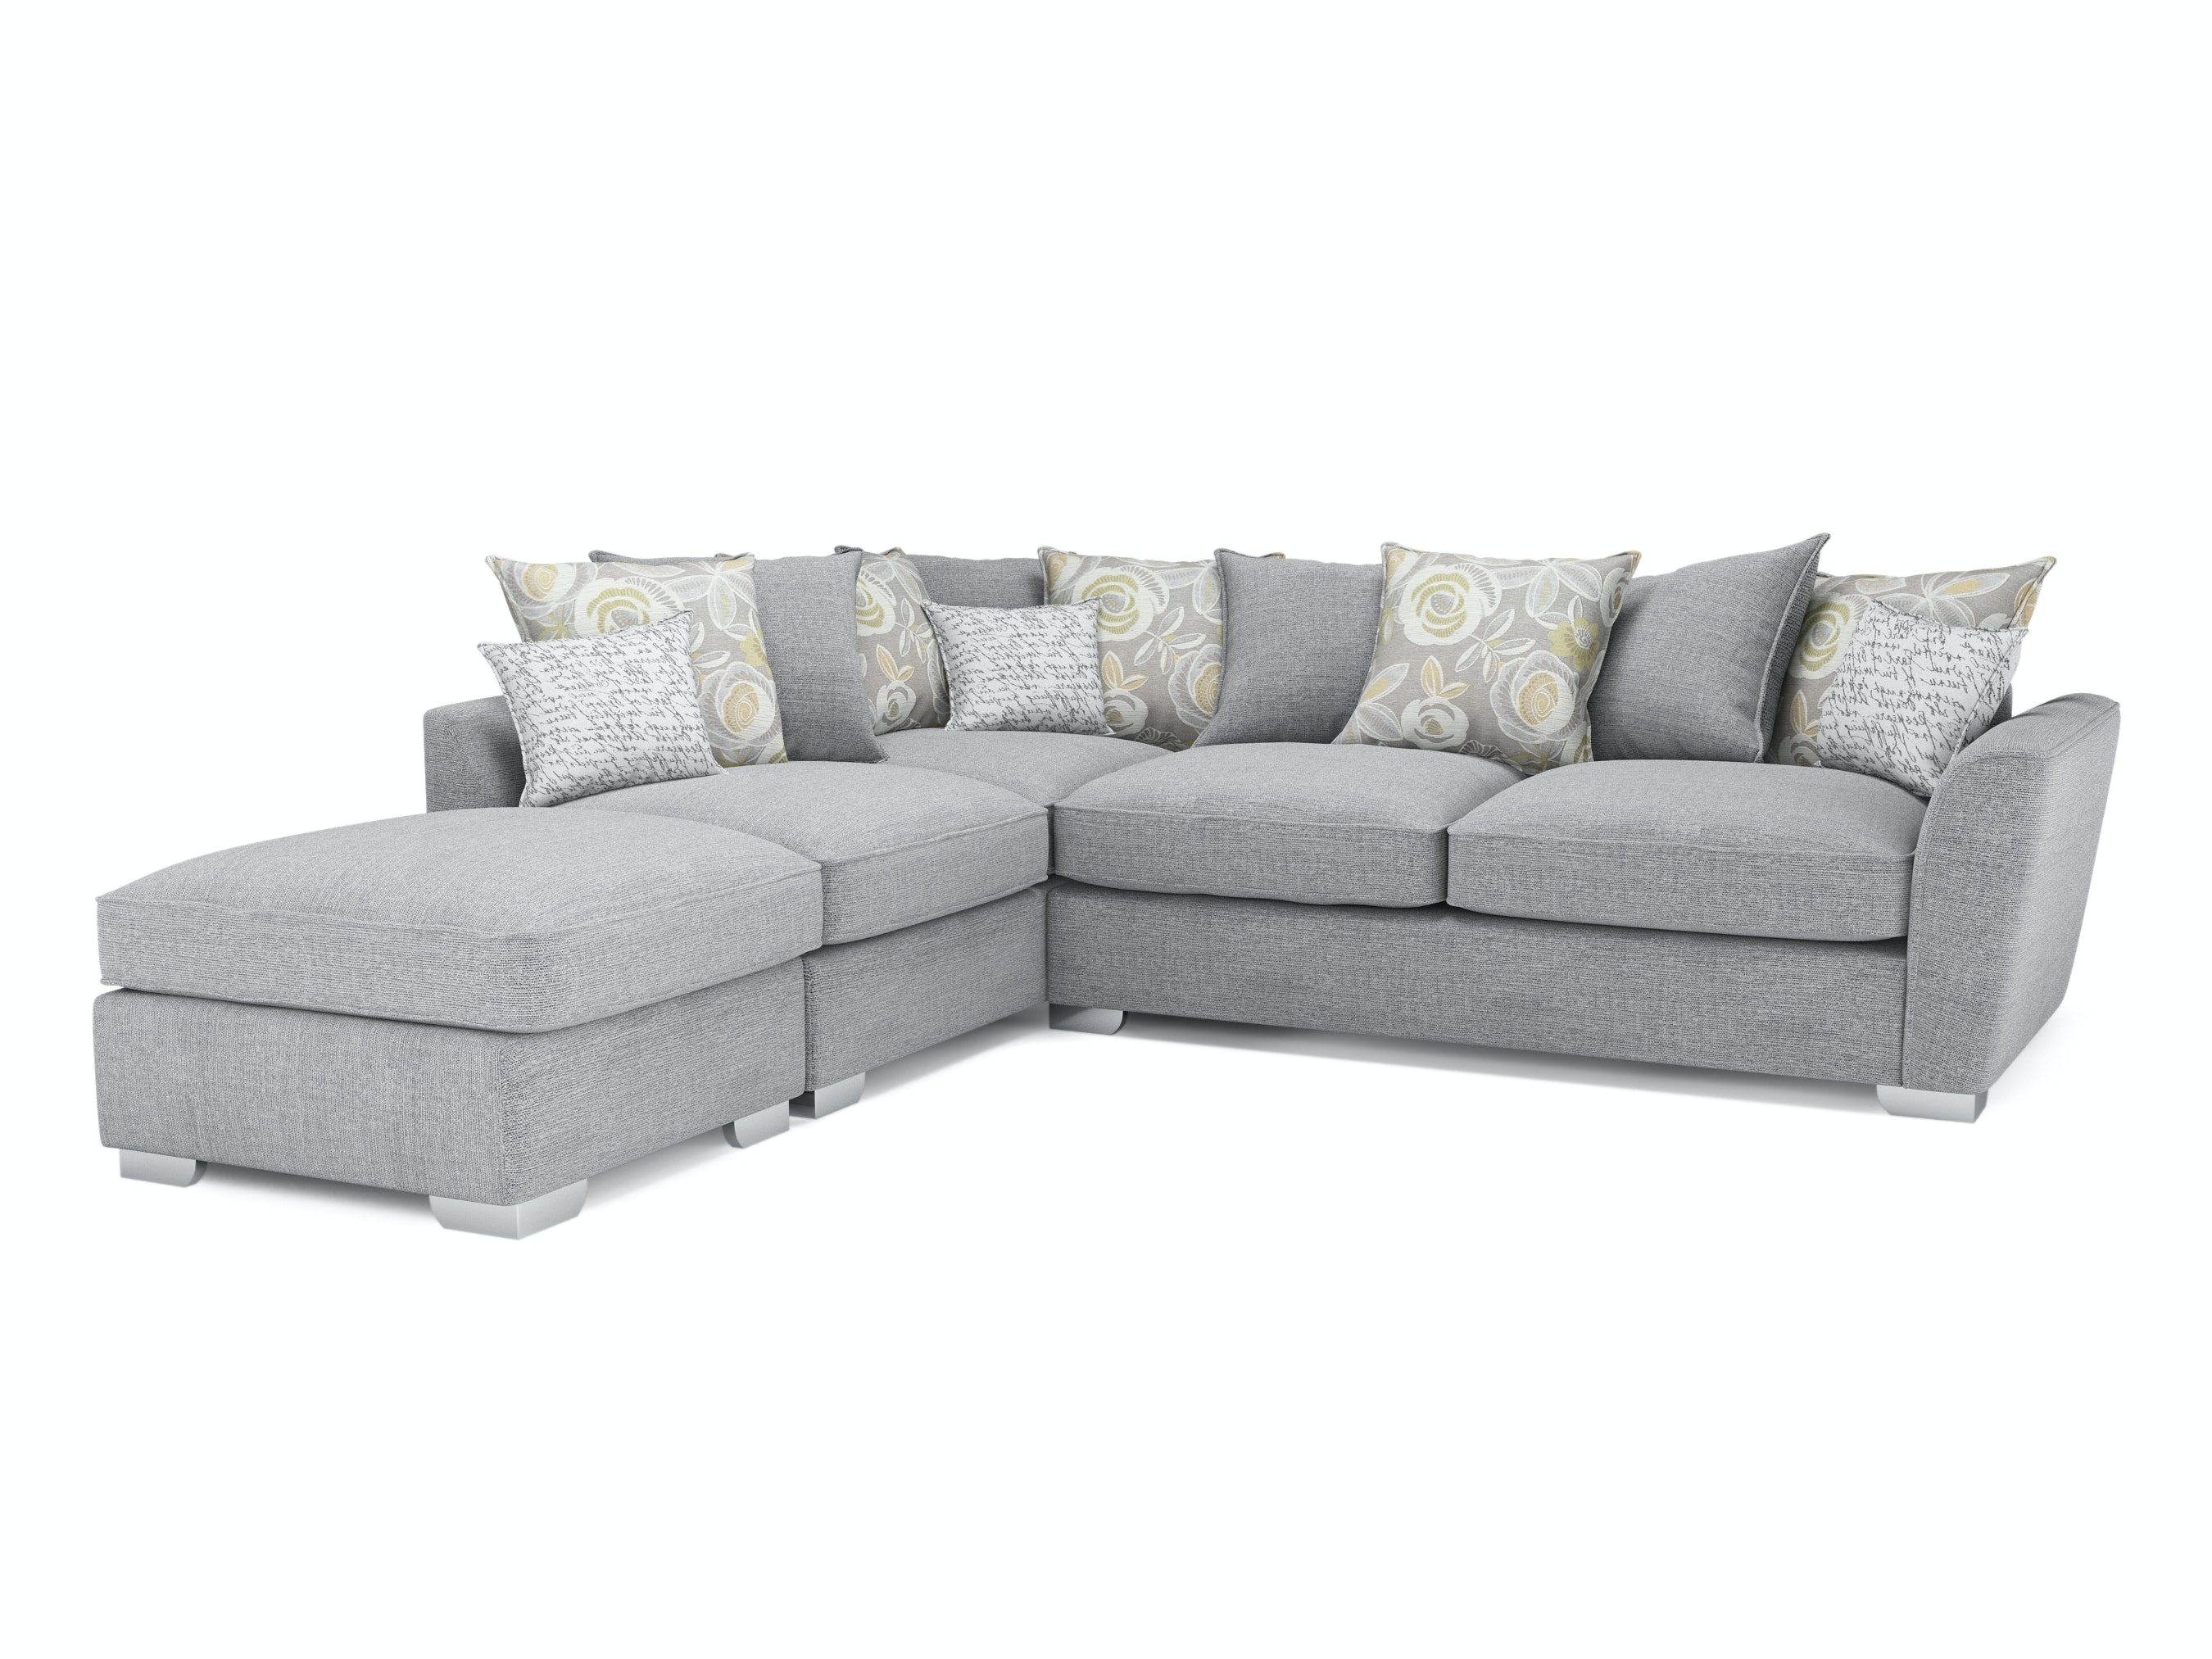 Fantasia Corner Sofa with Footstool